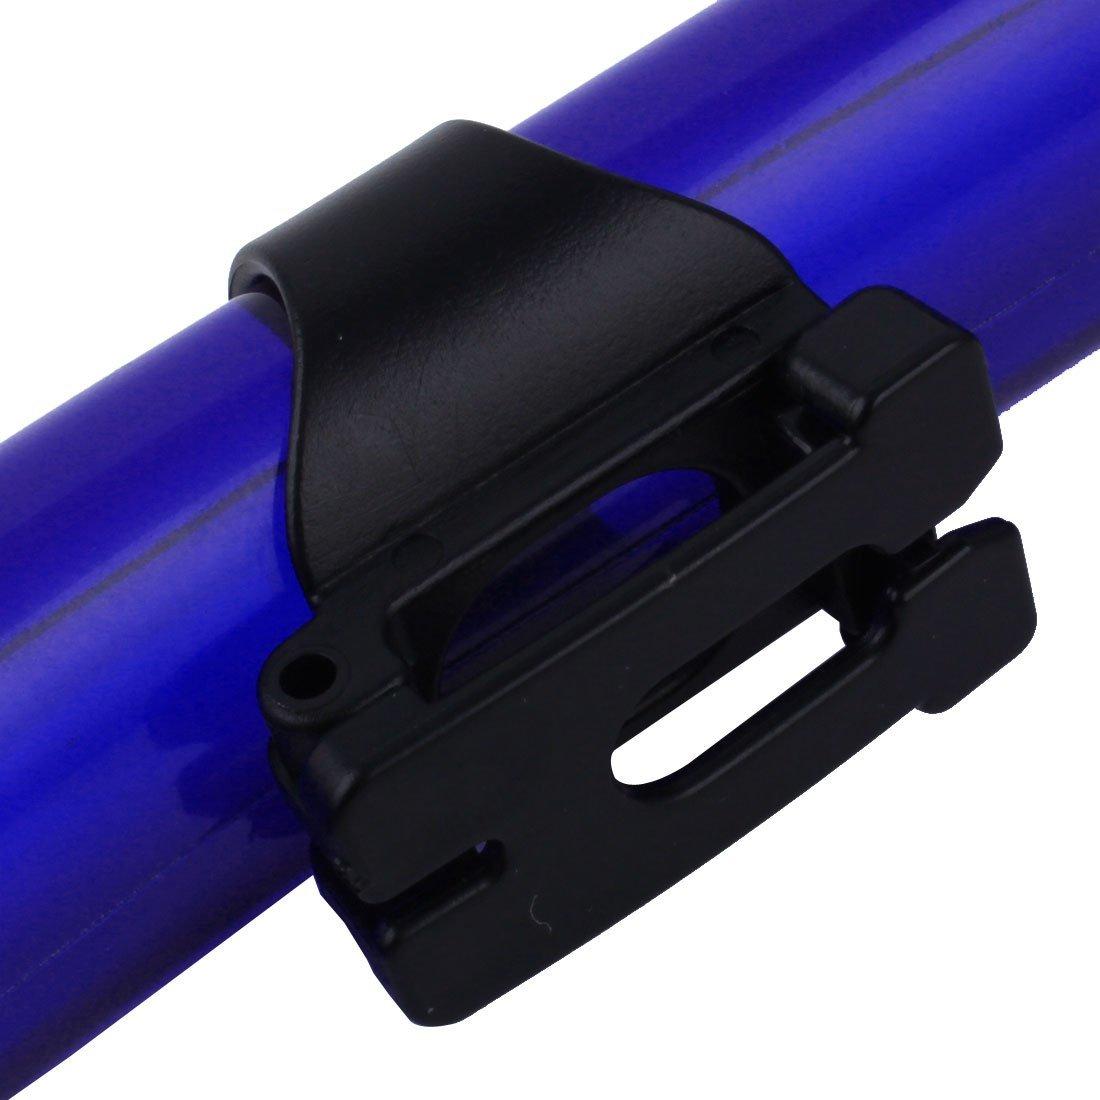 Amazon.com : eDealMax plástico Submarino Equipo de Natación de apnea Snorkel tubo de respiración de aire de buceo Snorkel Azul : Sports & Outdoors